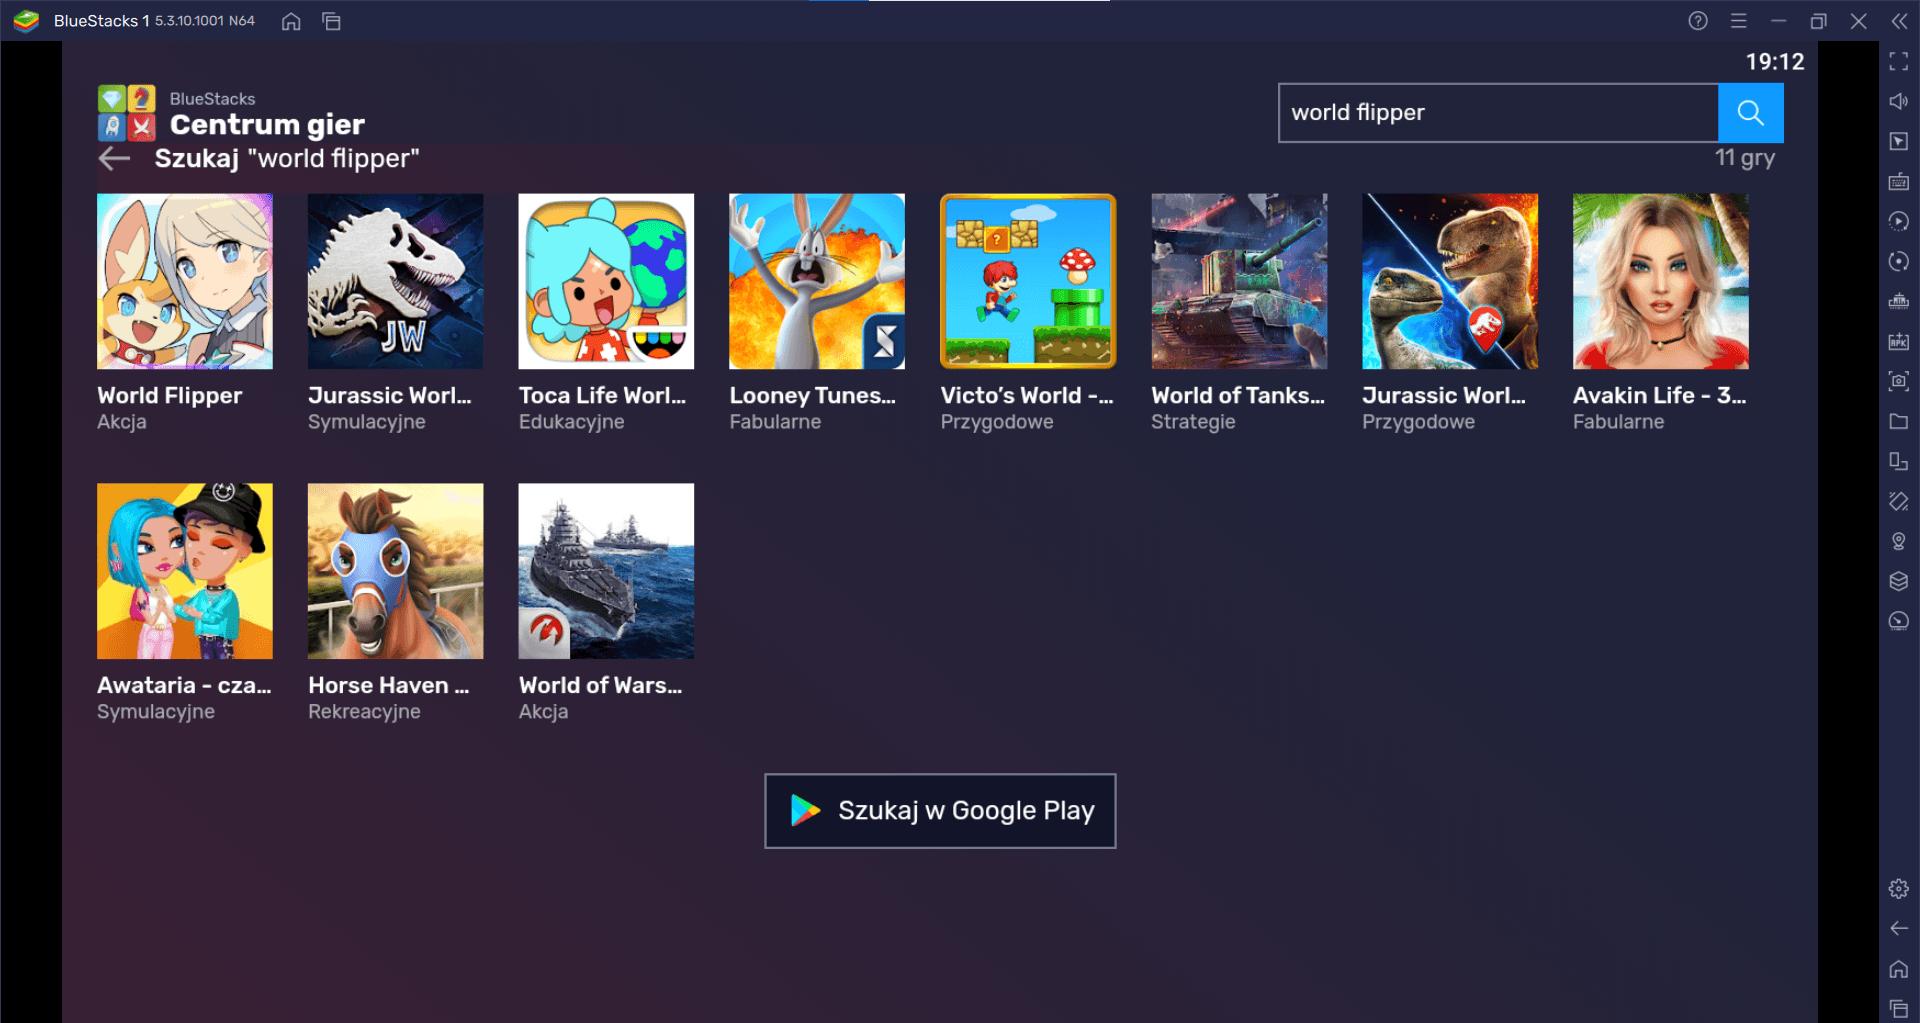 World Flipper na komputerze z BlueStacks